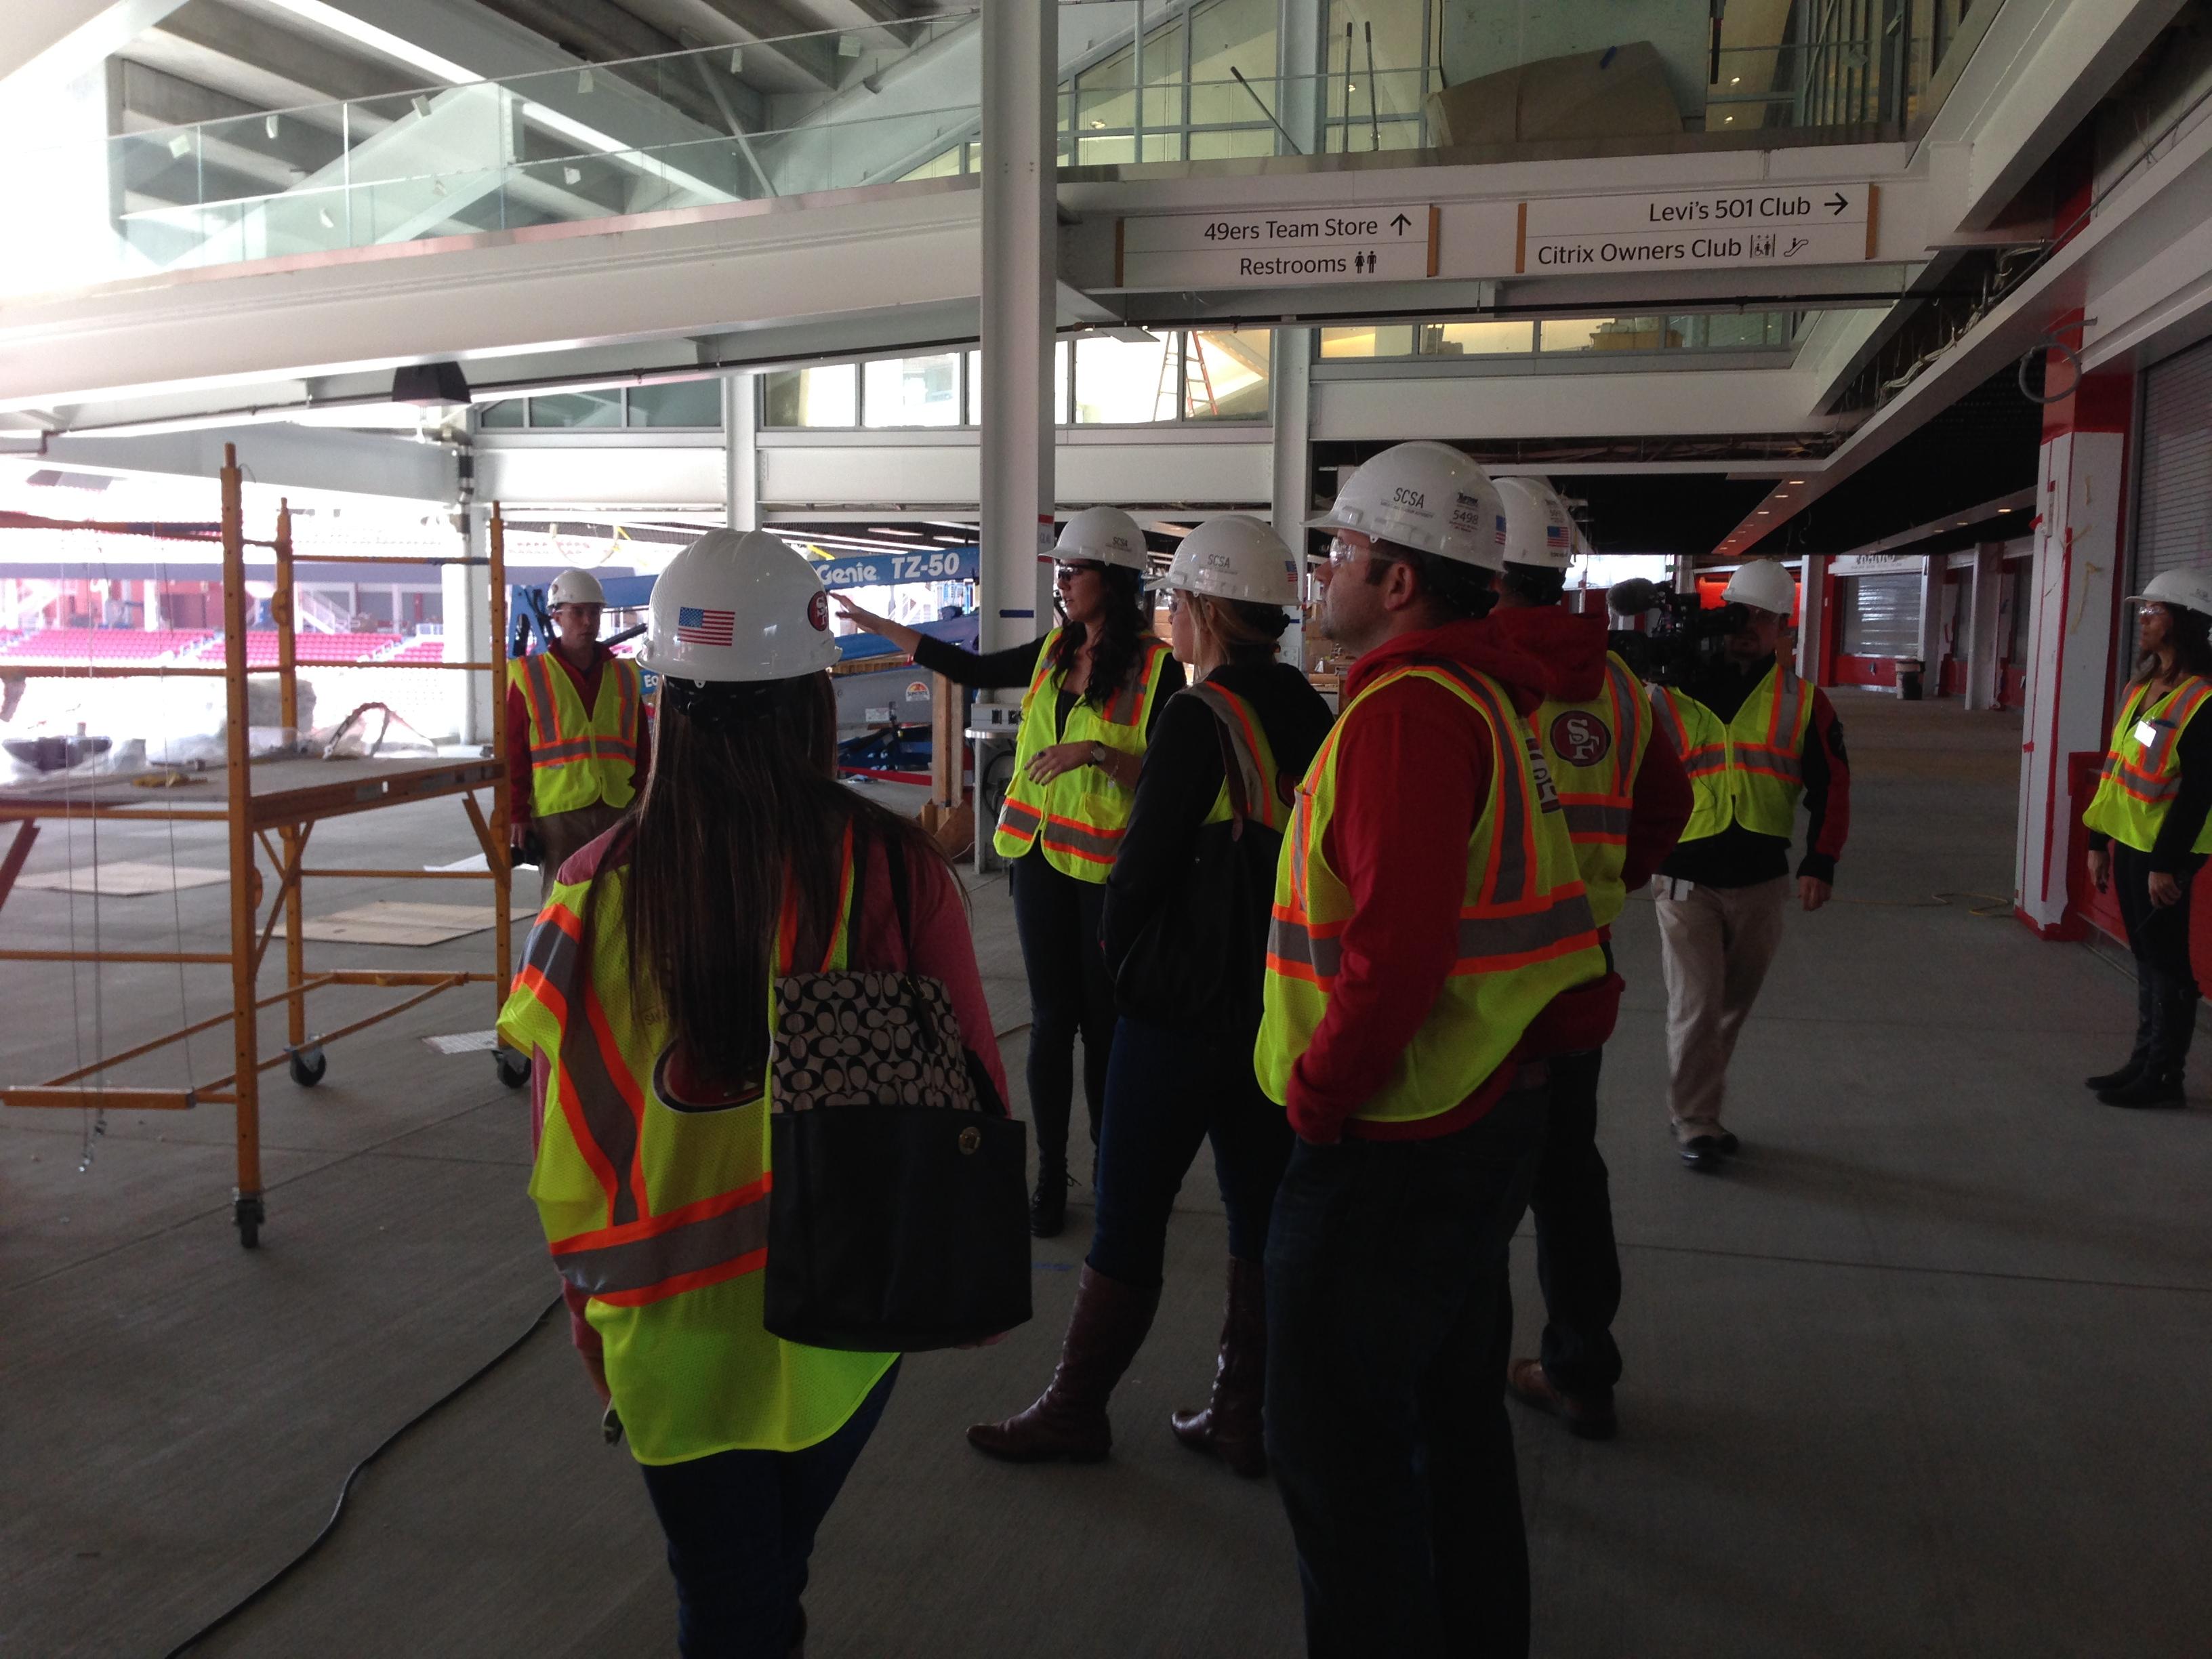 Image 4 of Scott & Sarah: 49ers Fan Proposes in New Stadium